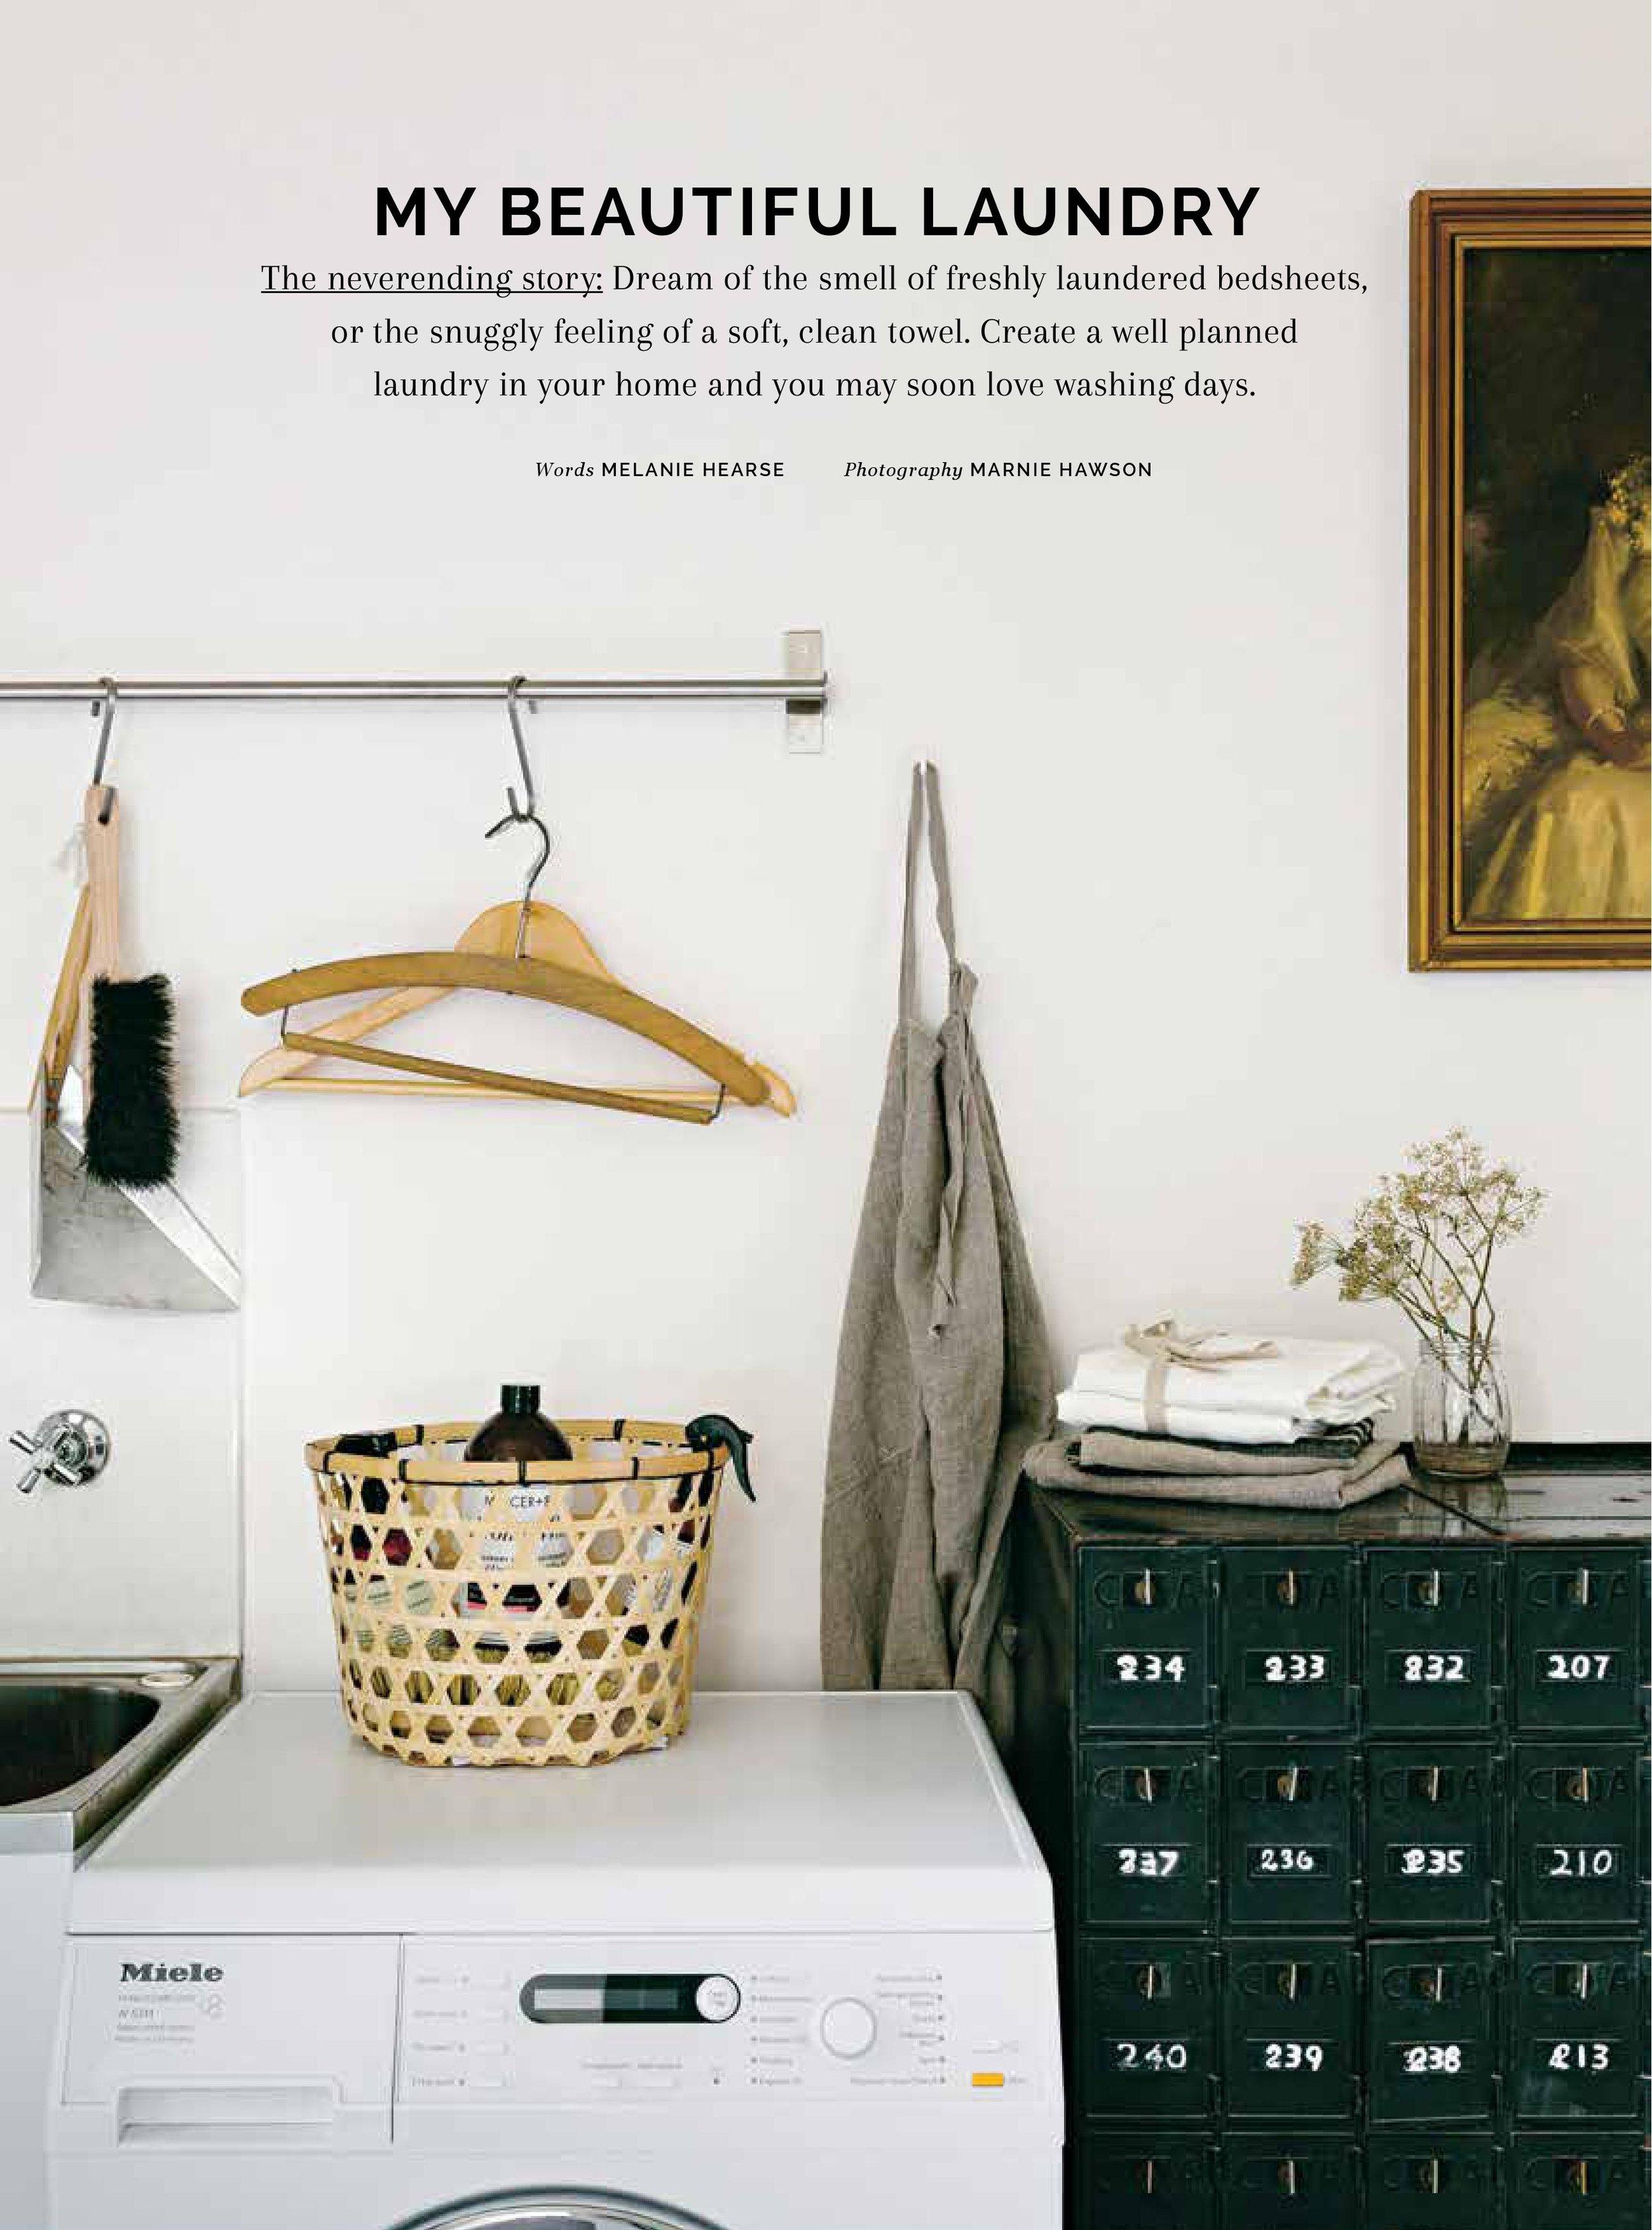 Homelife magazine, my beautiful laundry by Marnie Hawson